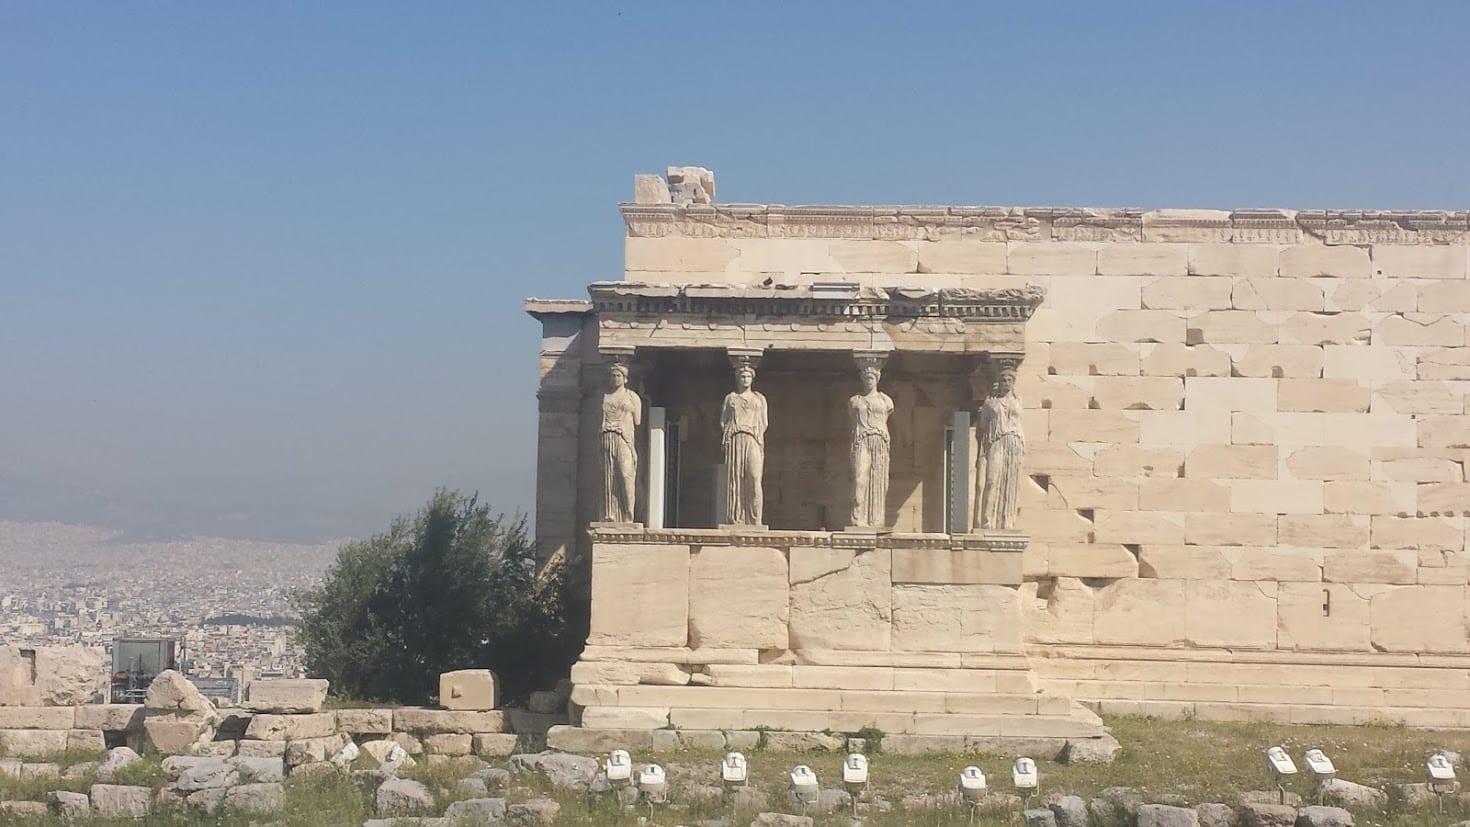 Erechtheion in the Acropolis of Athens